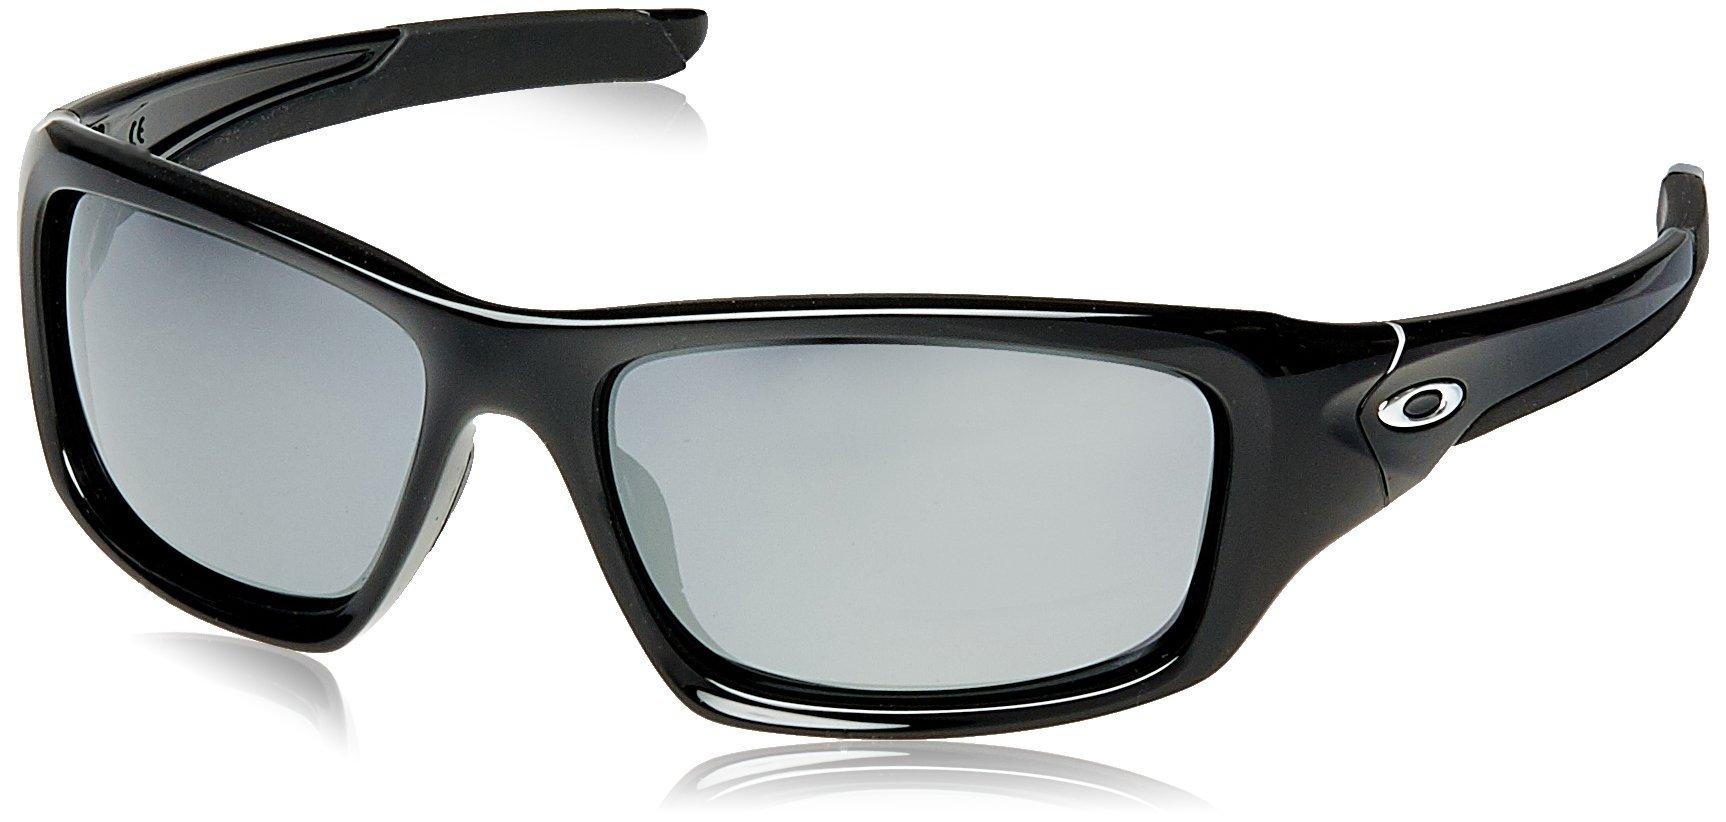 Oakley Valve Non-polarized Rectangular Sunglasses,Polished Black w/ Black Iridium,60 mm